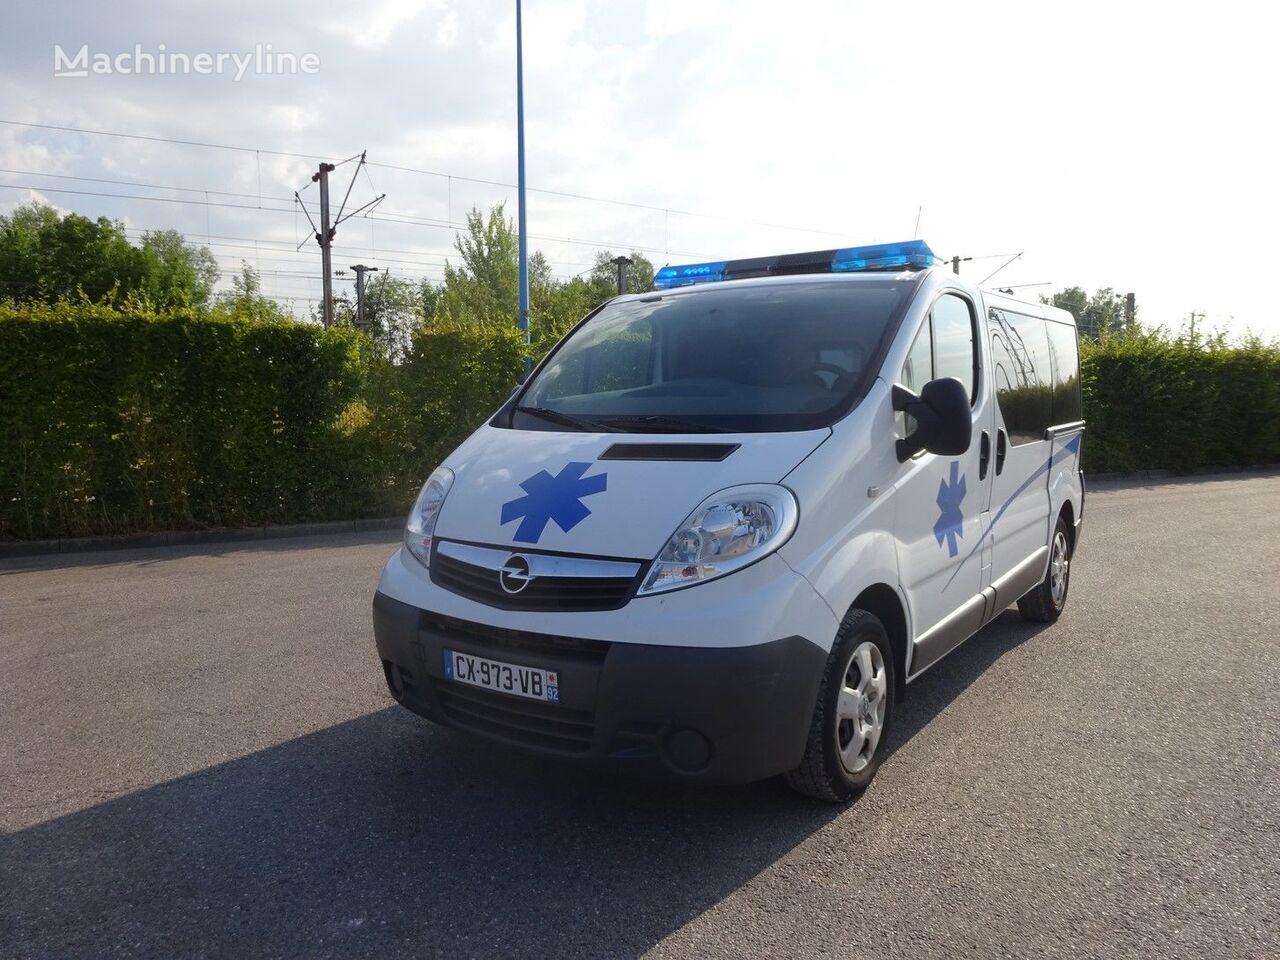 OPEL VIVARO L1H1 115 CV 2013 ambulancia